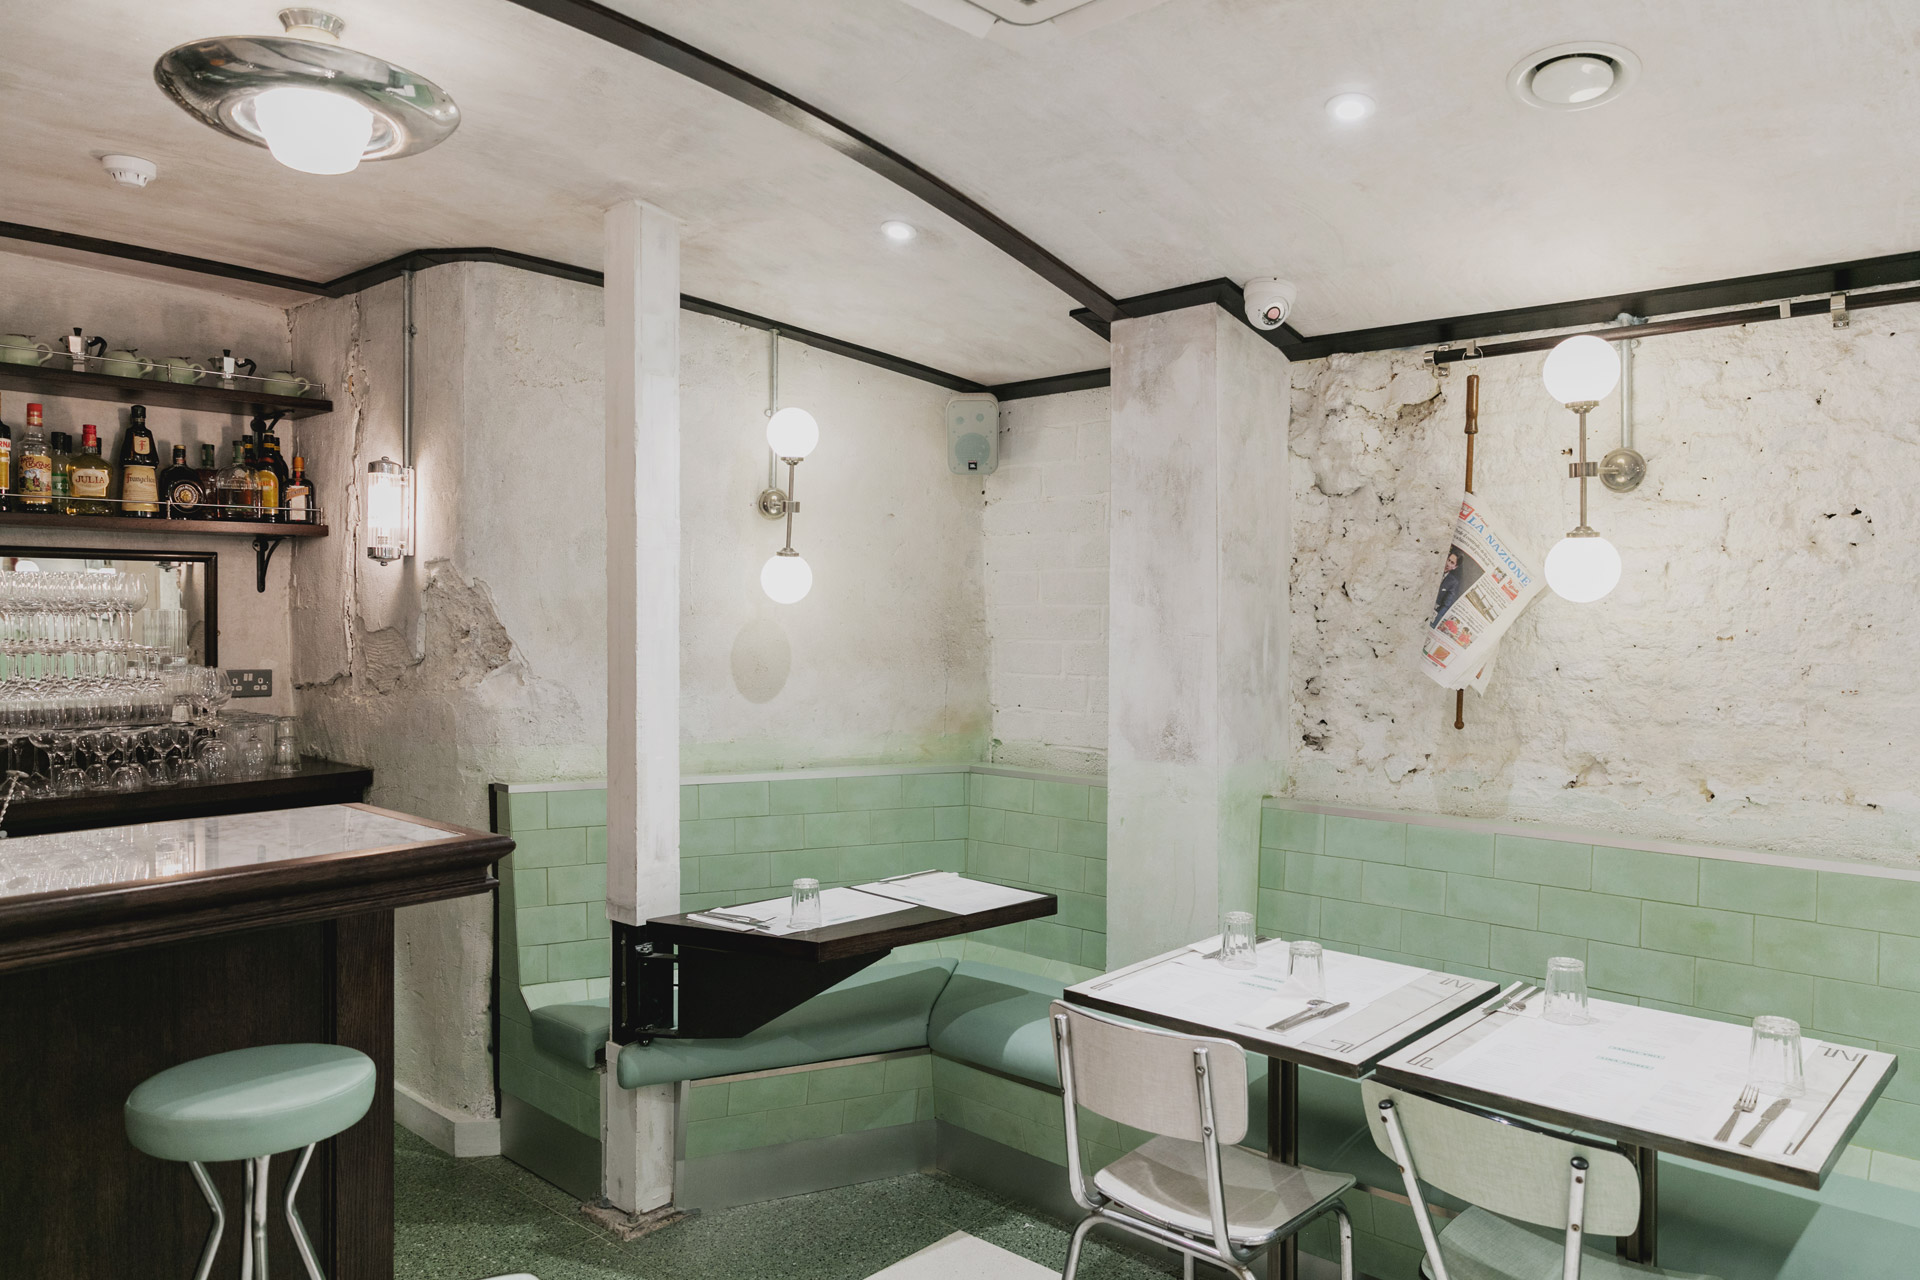 Legendary Italian delicatessen Lina Stores uses our globe wall lights in new Soho restaurant